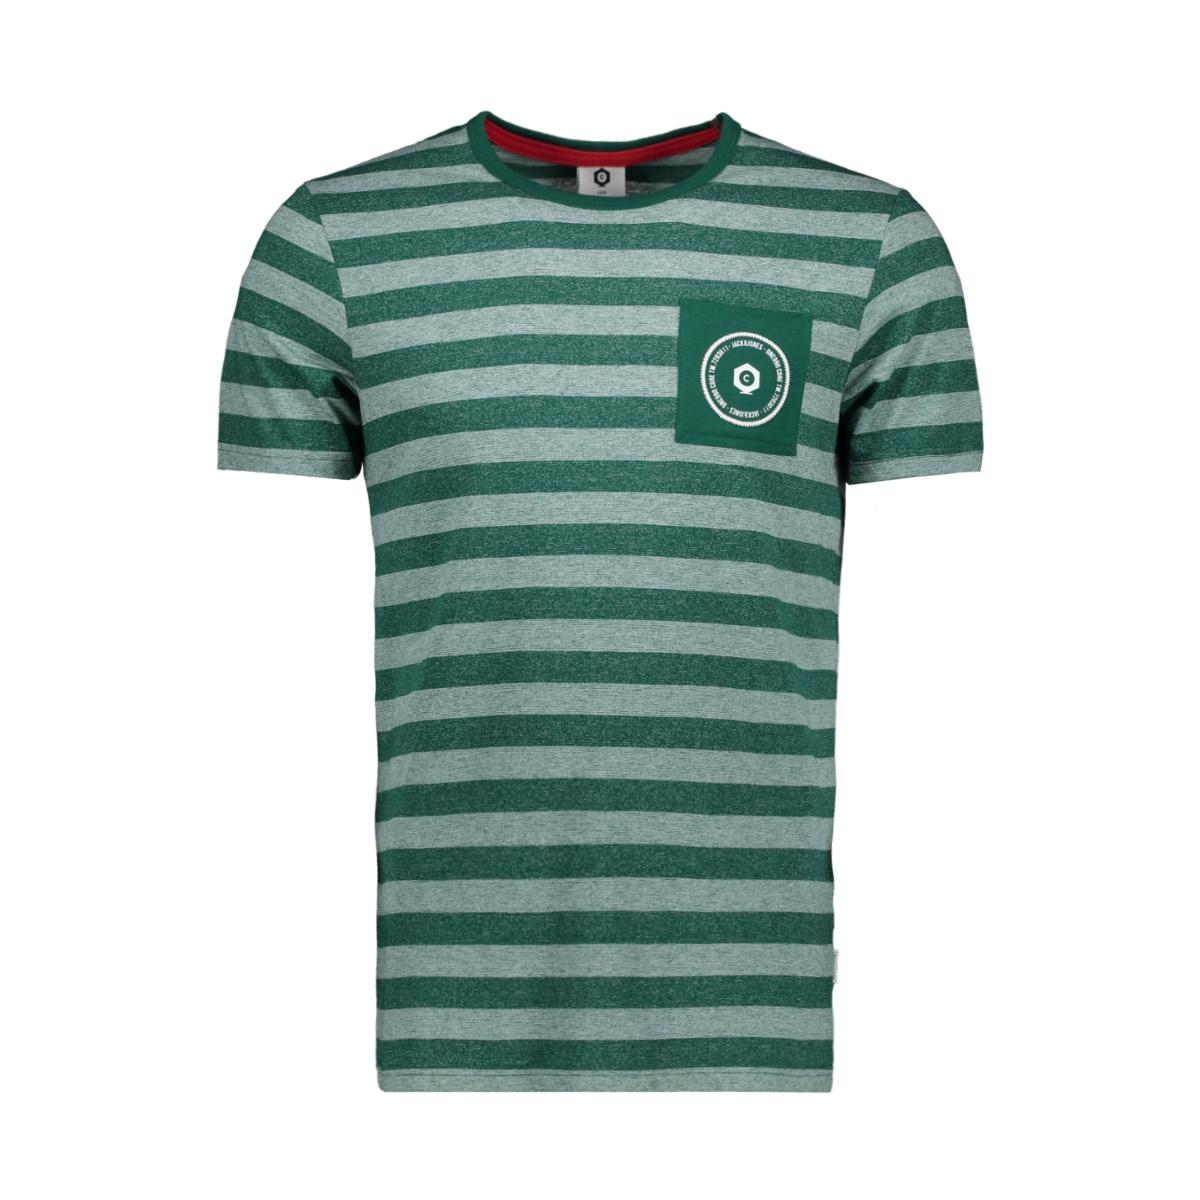 jcodenny tee ss crew neck 12148515 jack & jones t-shirt evergreen/slim